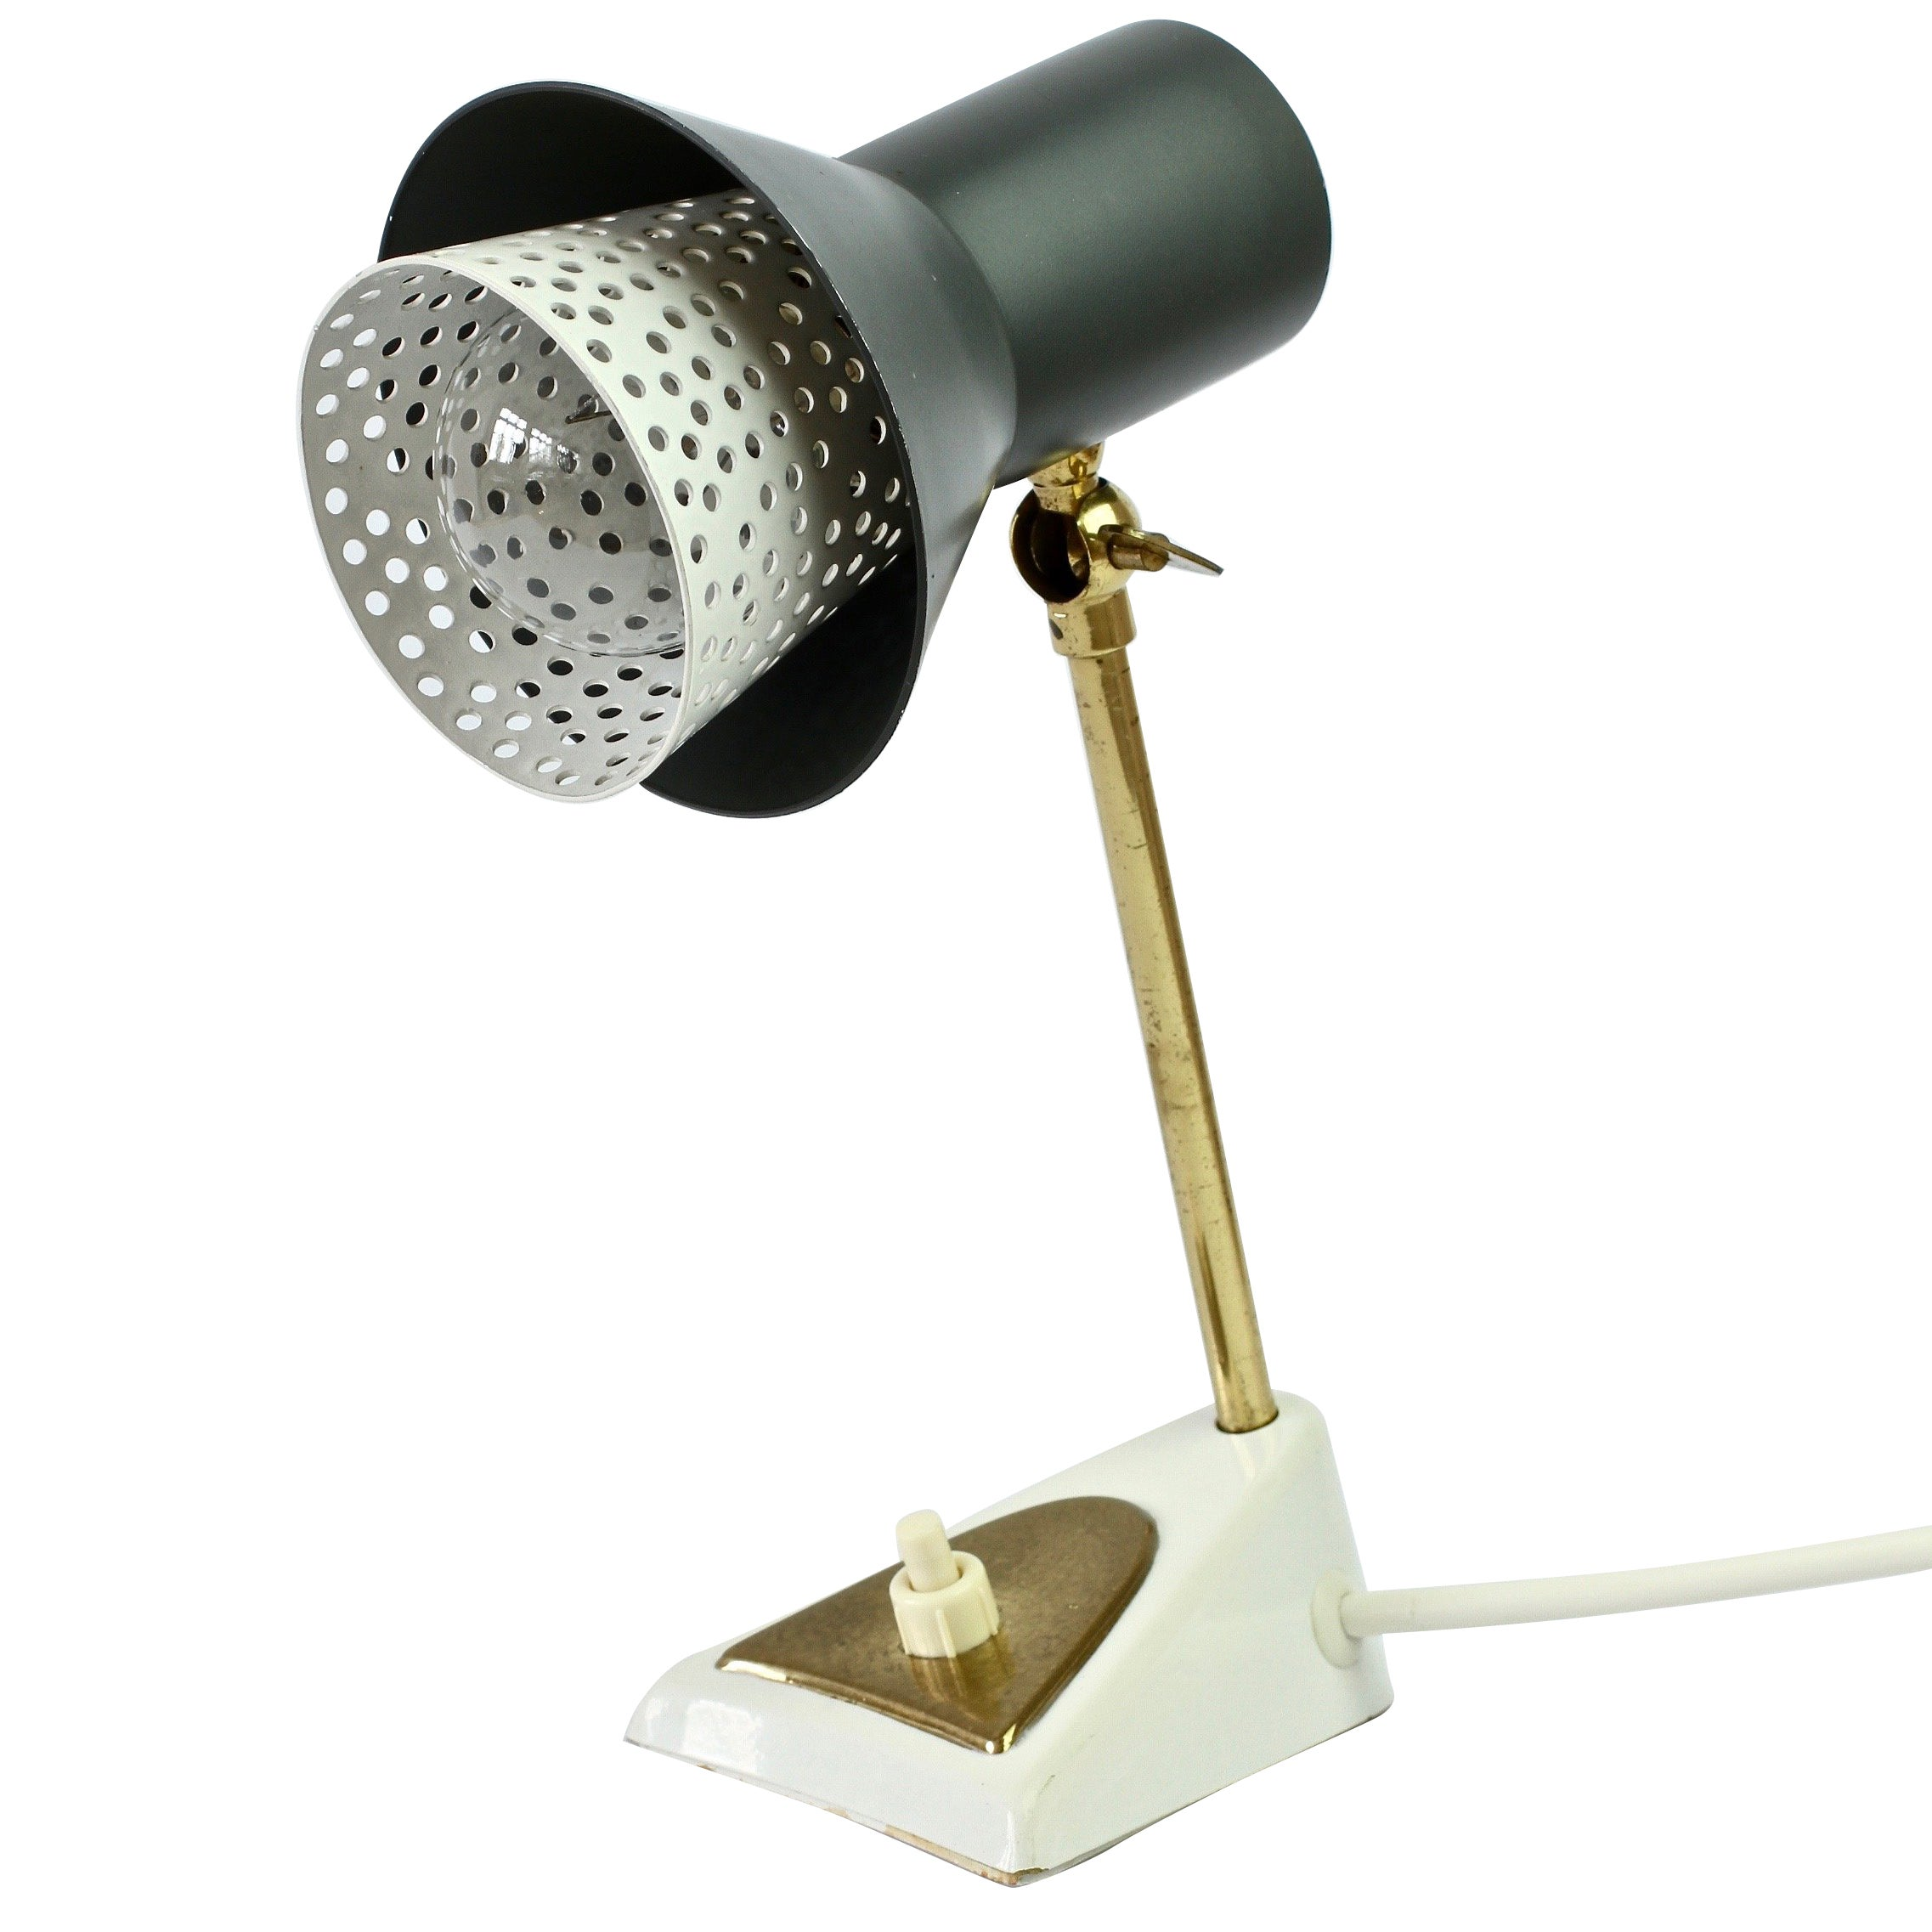 Mathieu Matégot Style 1950s Perforated Metal Shade Table Lamp or Desk Light